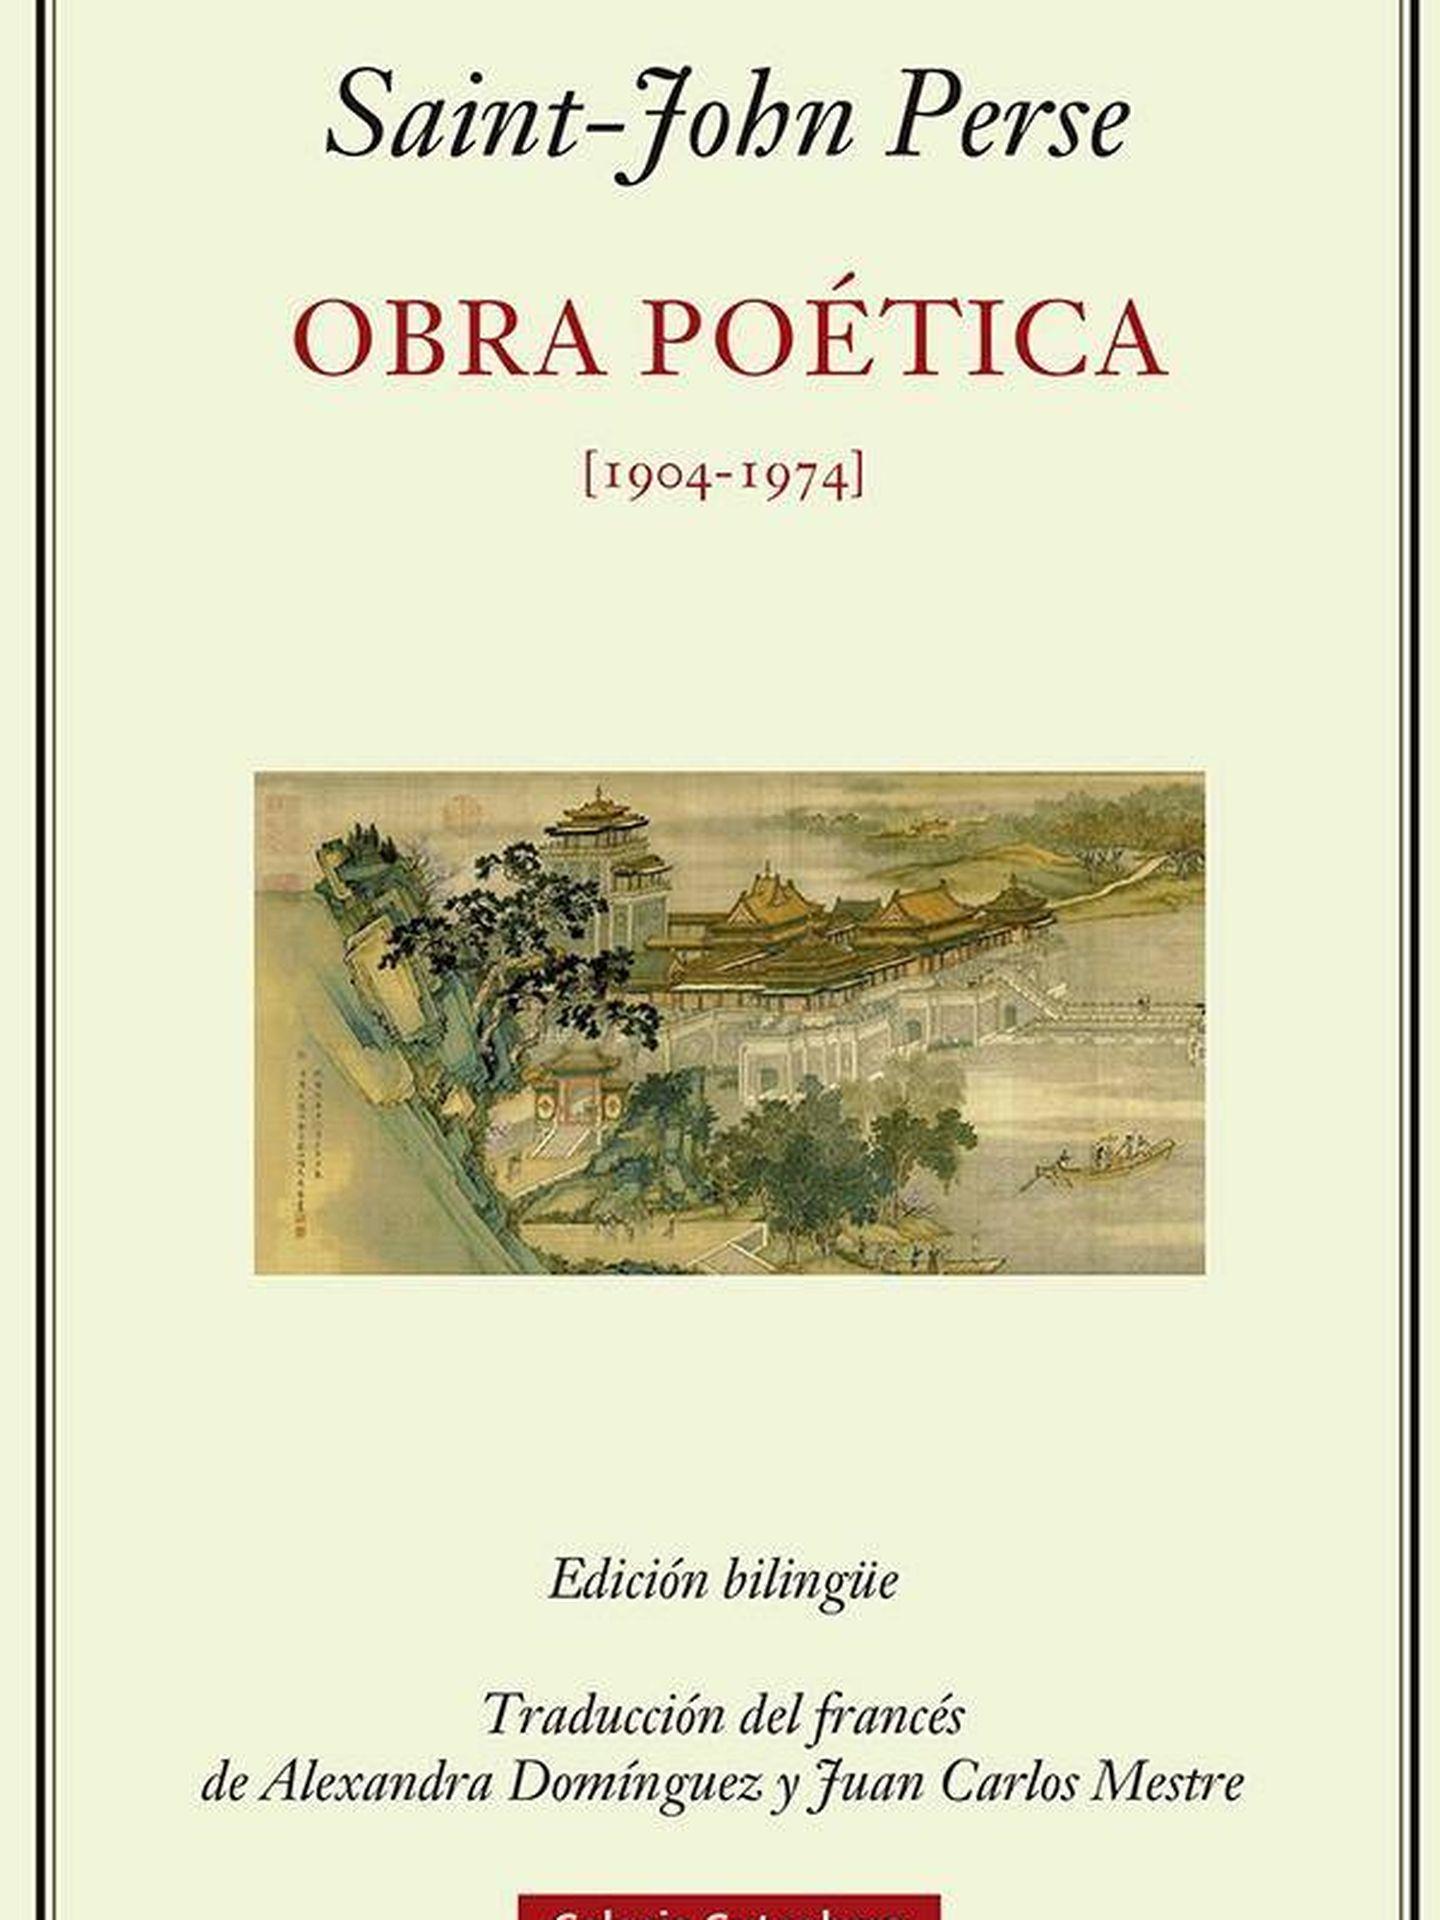 'Obra poética' (Galaxia Gutenberg)